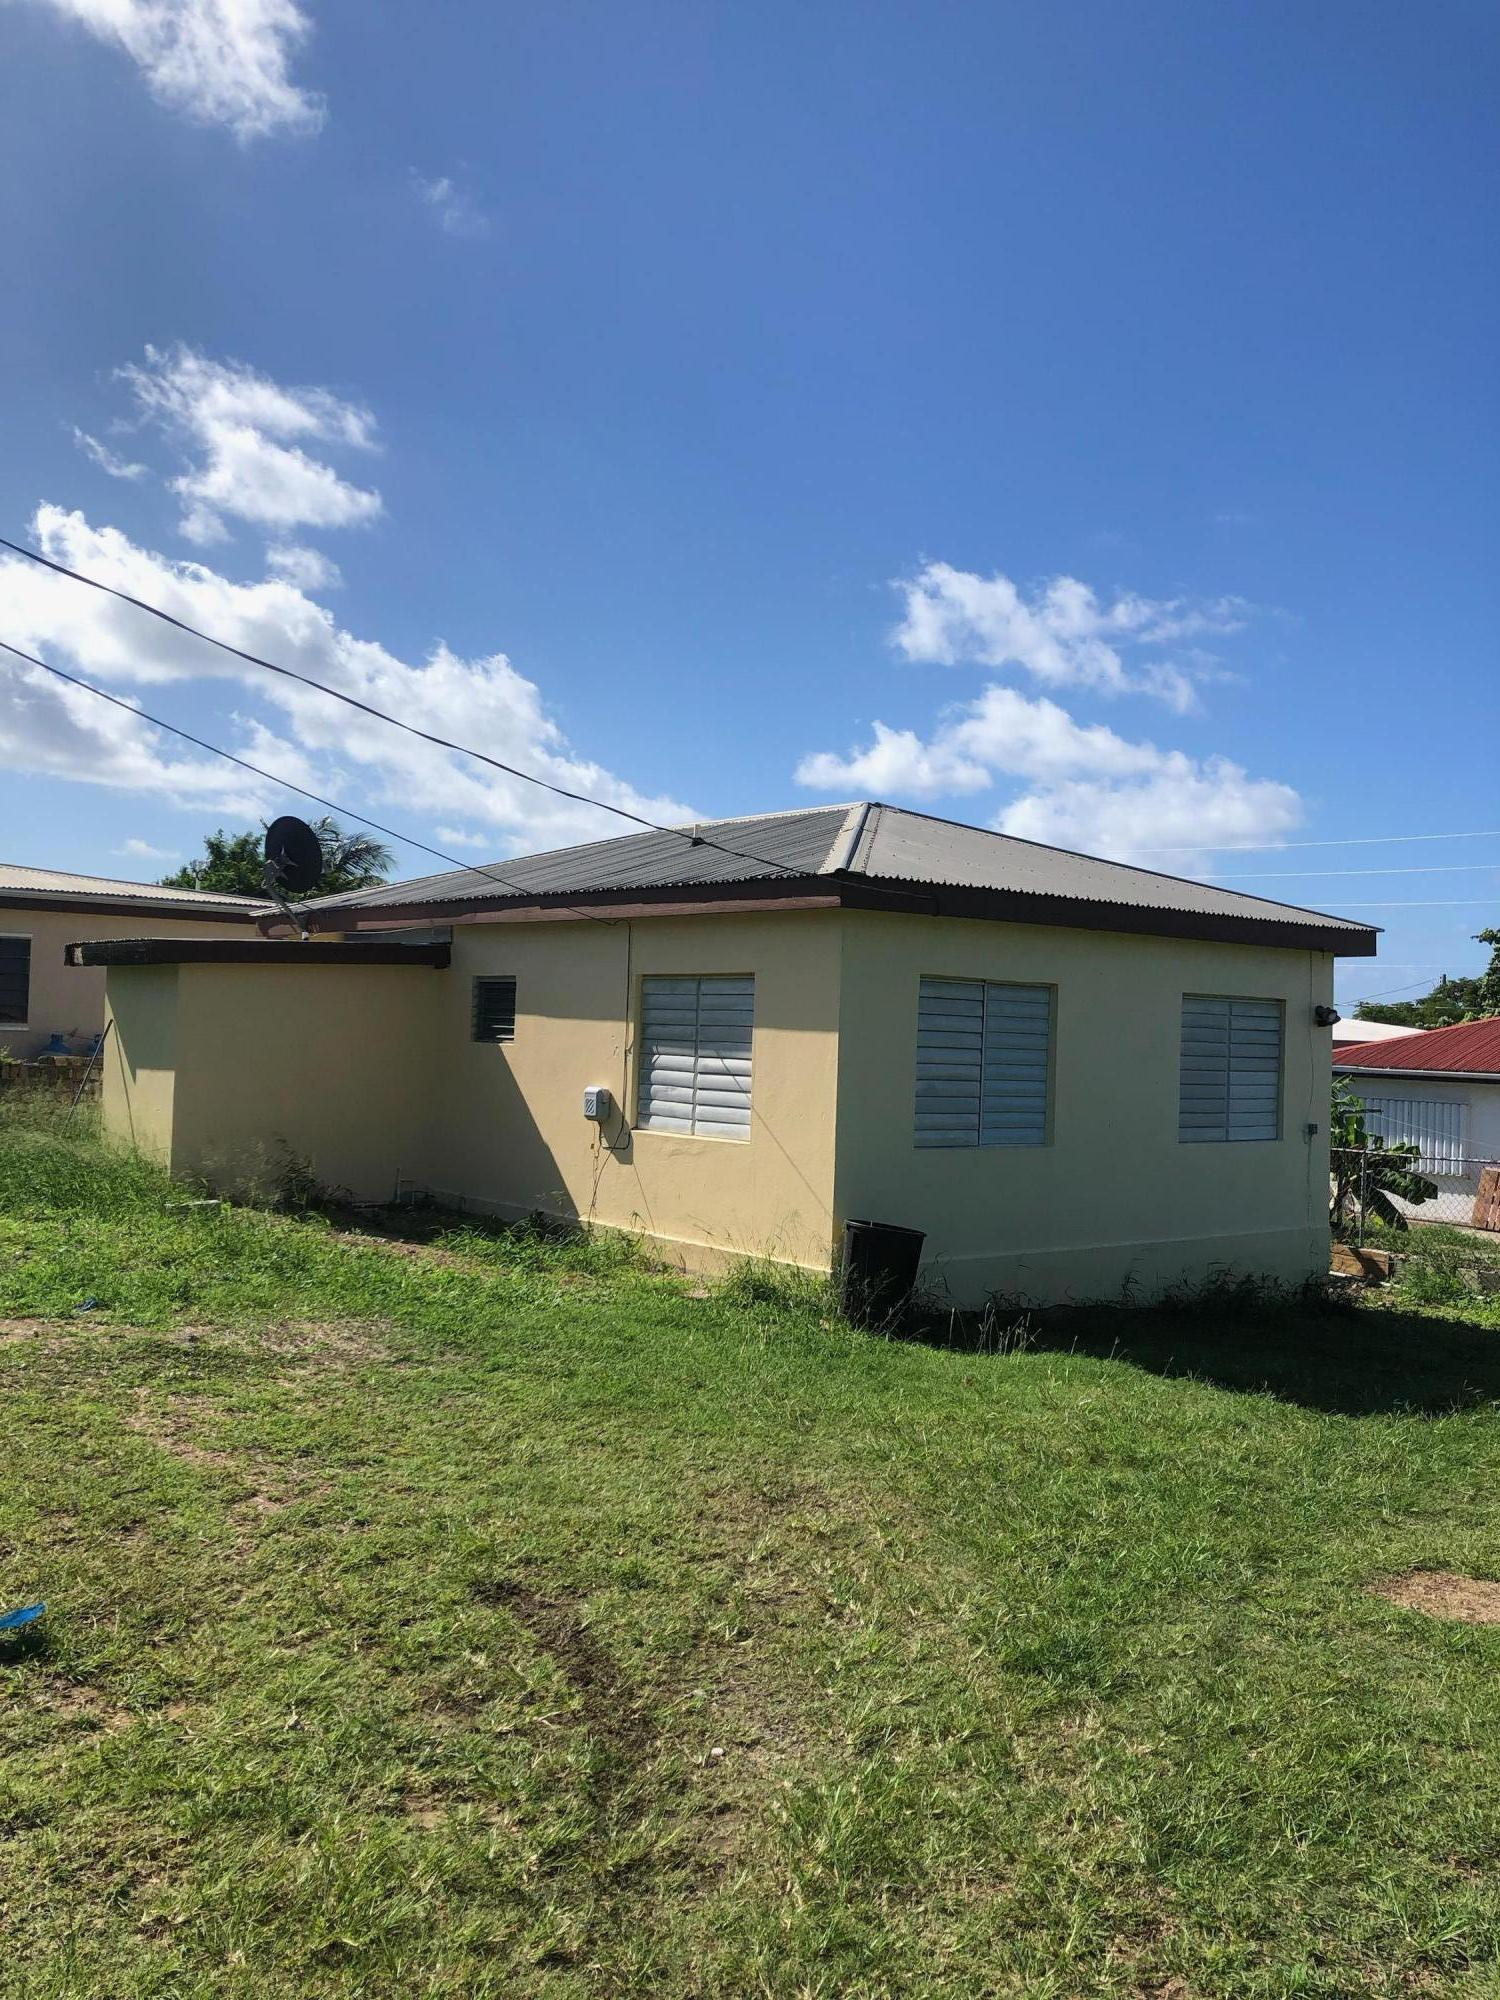 RE/MAX real estate, US Virgin Islands, Peters Rest, Status Change  Res Rental  Peters Rest QU